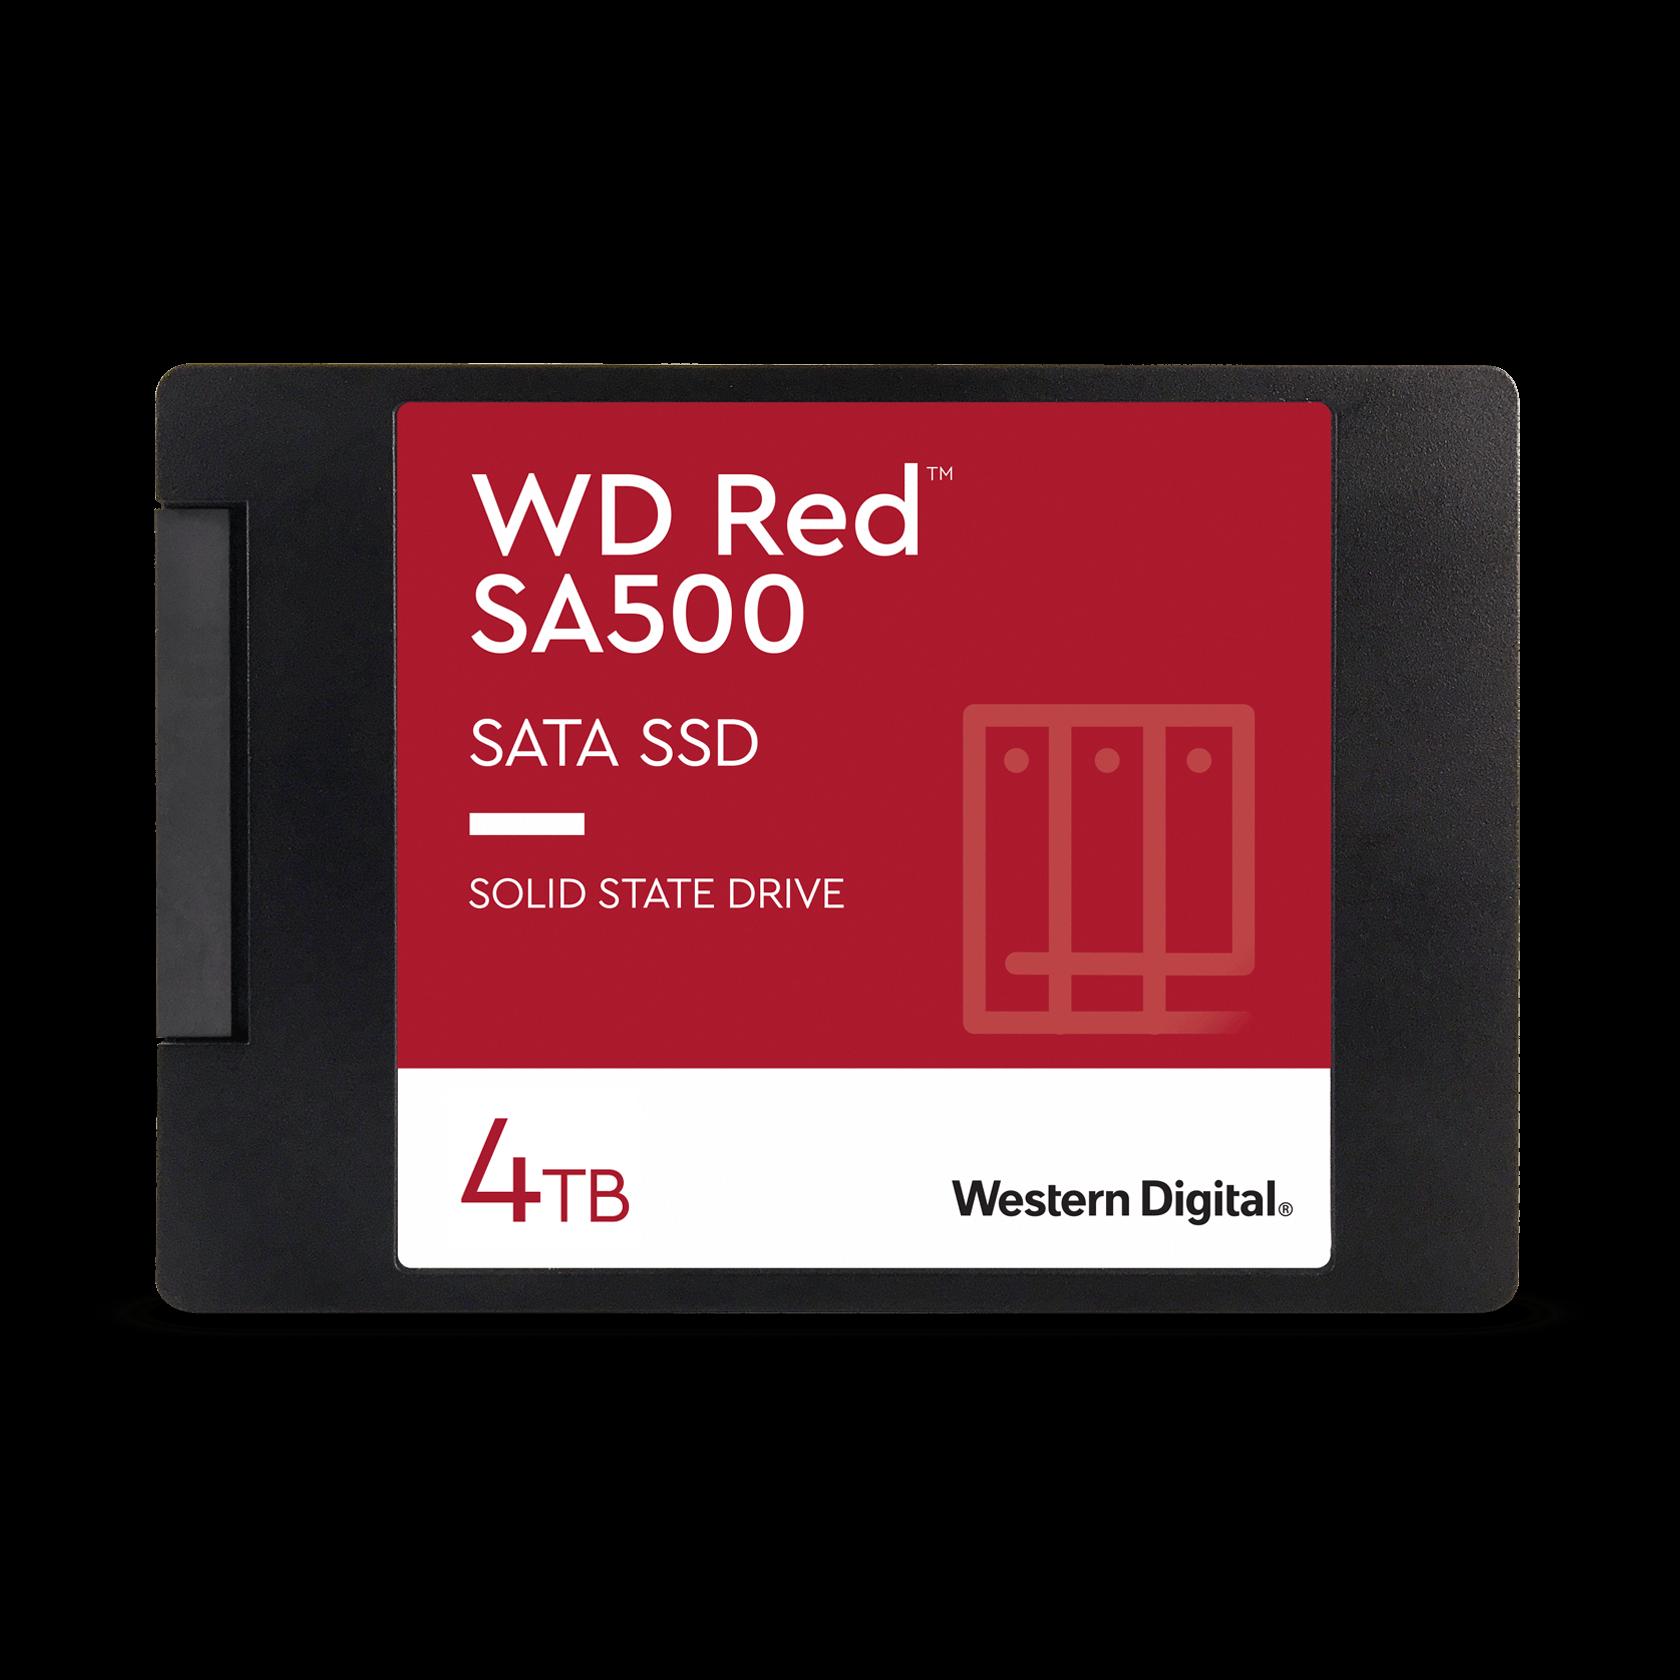 Western Digital 4TB WD Red™ SA500 NAS SATA - WDS400T1R0A ...